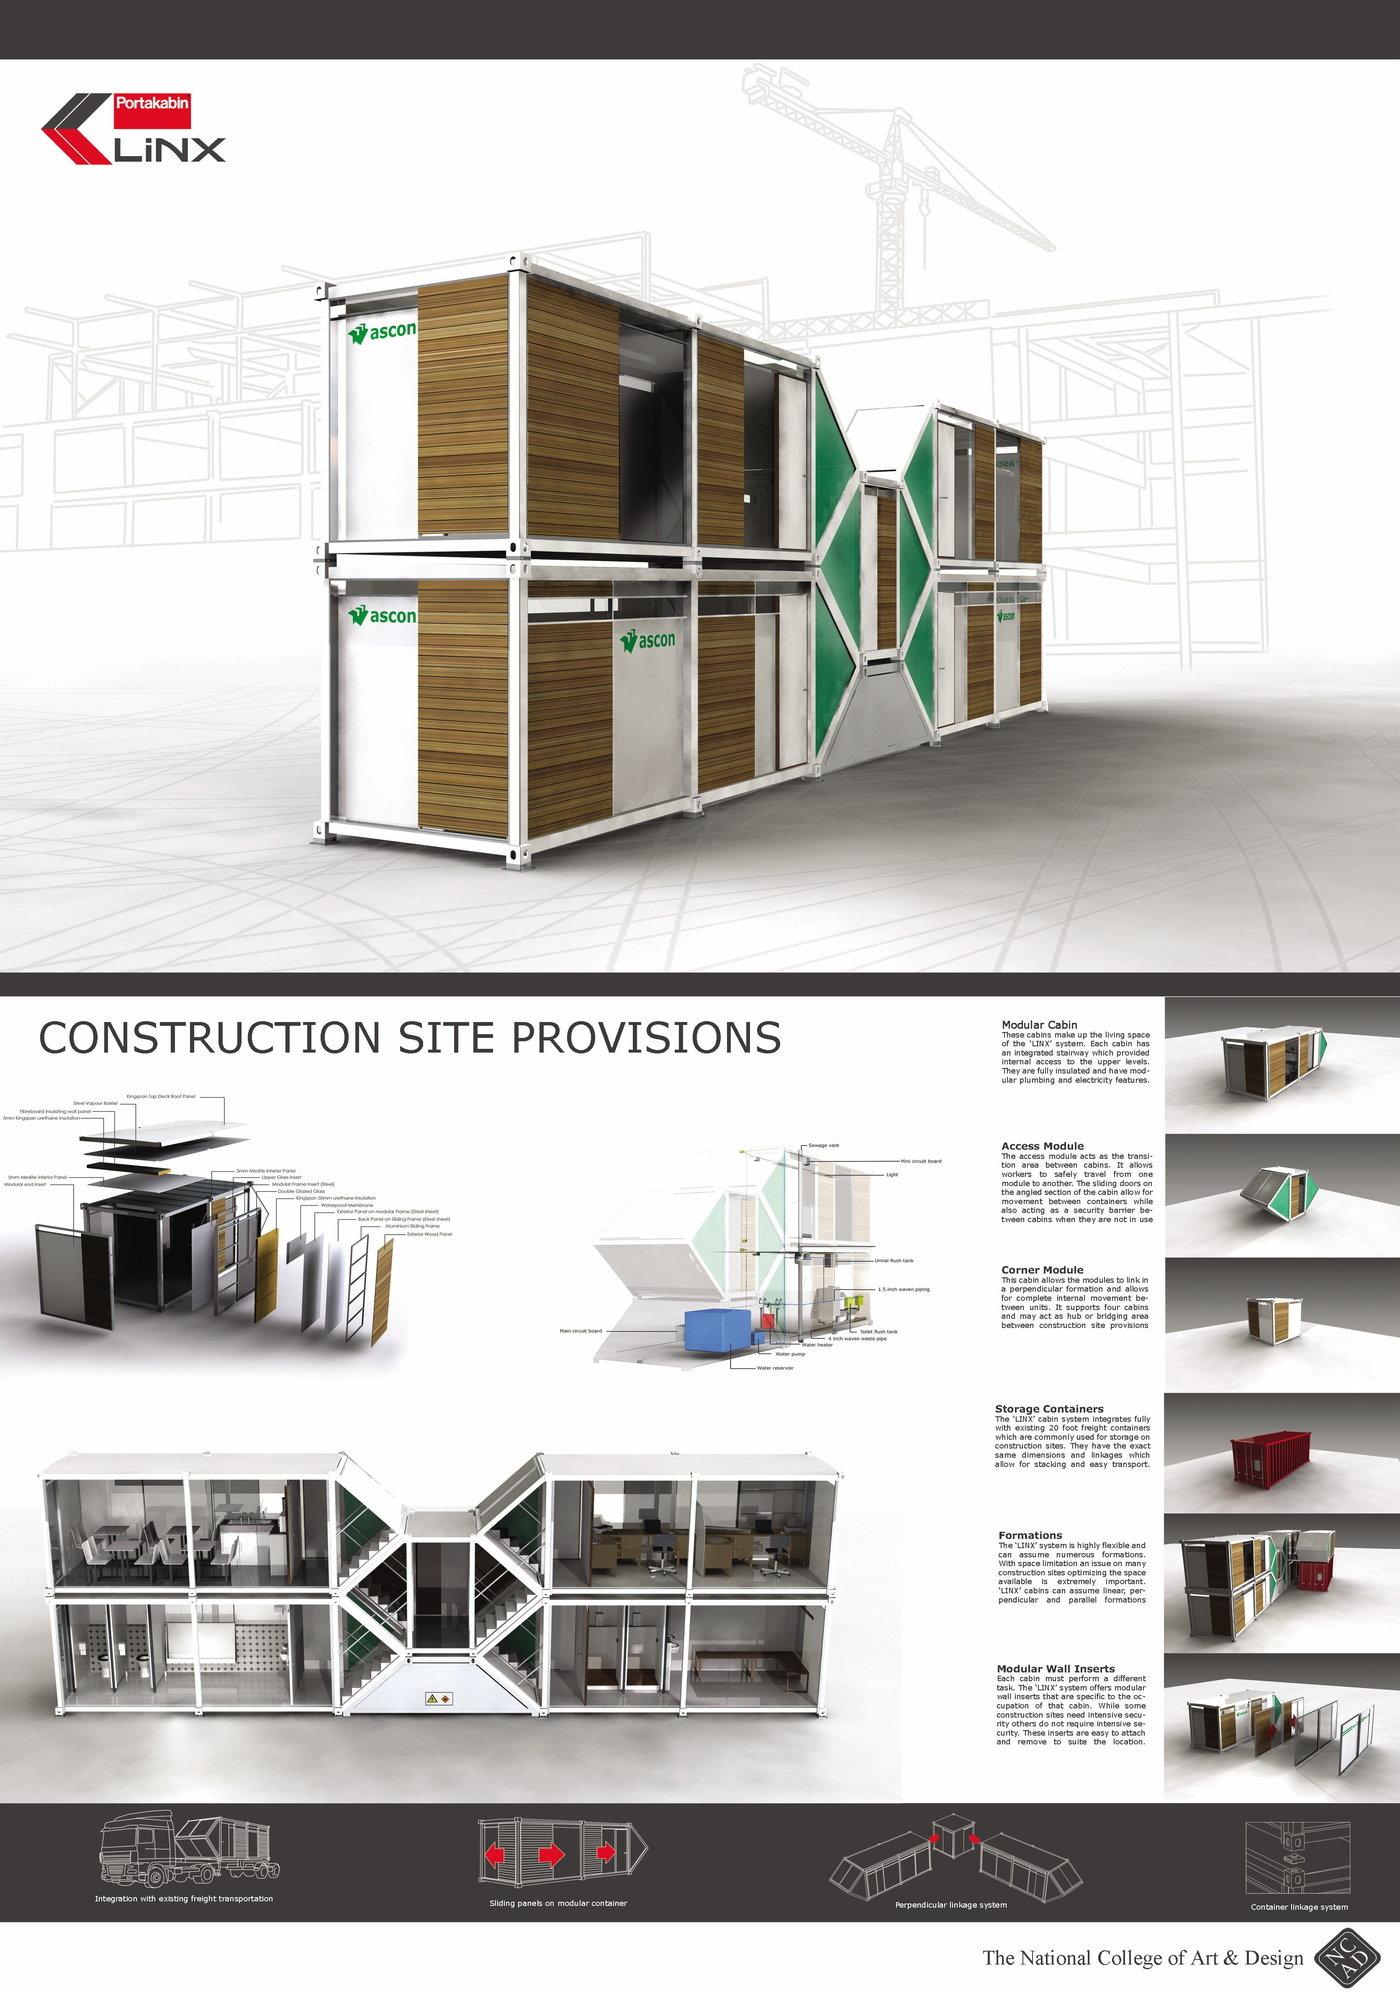 linx prefab by richard barnwall at. Black Bedroom Furniture Sets. Home Design Ideas